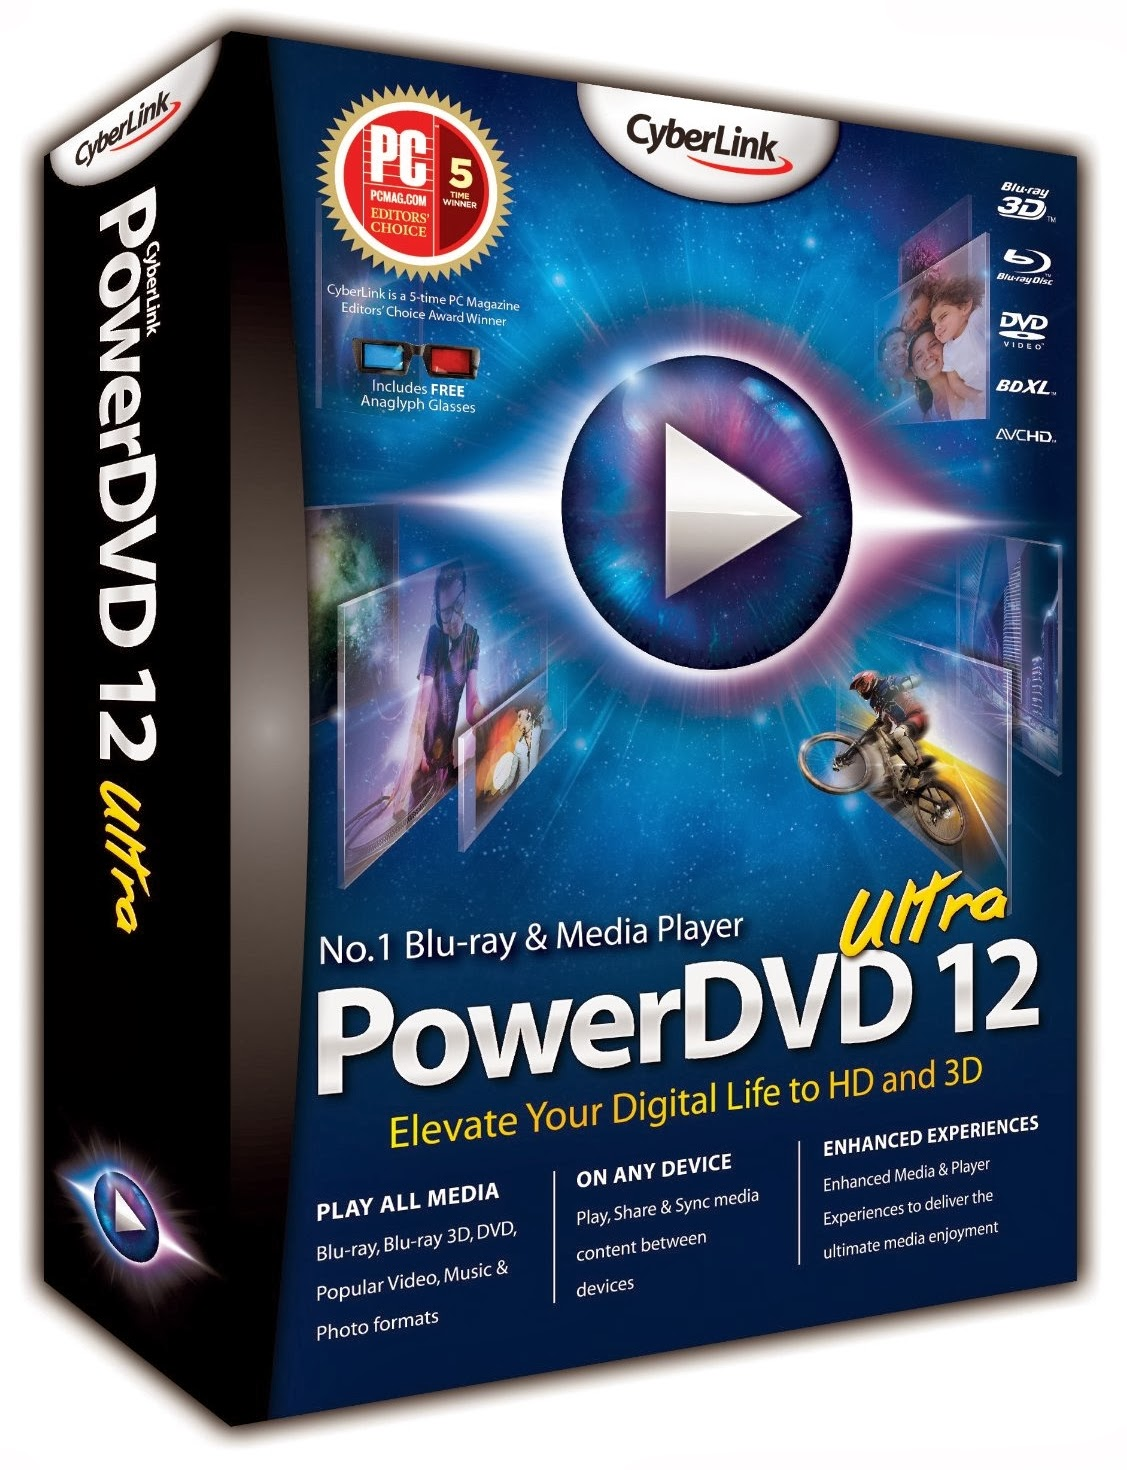 Descarga Versin de prueba Gratis de Power2Go 11 - CyberLink